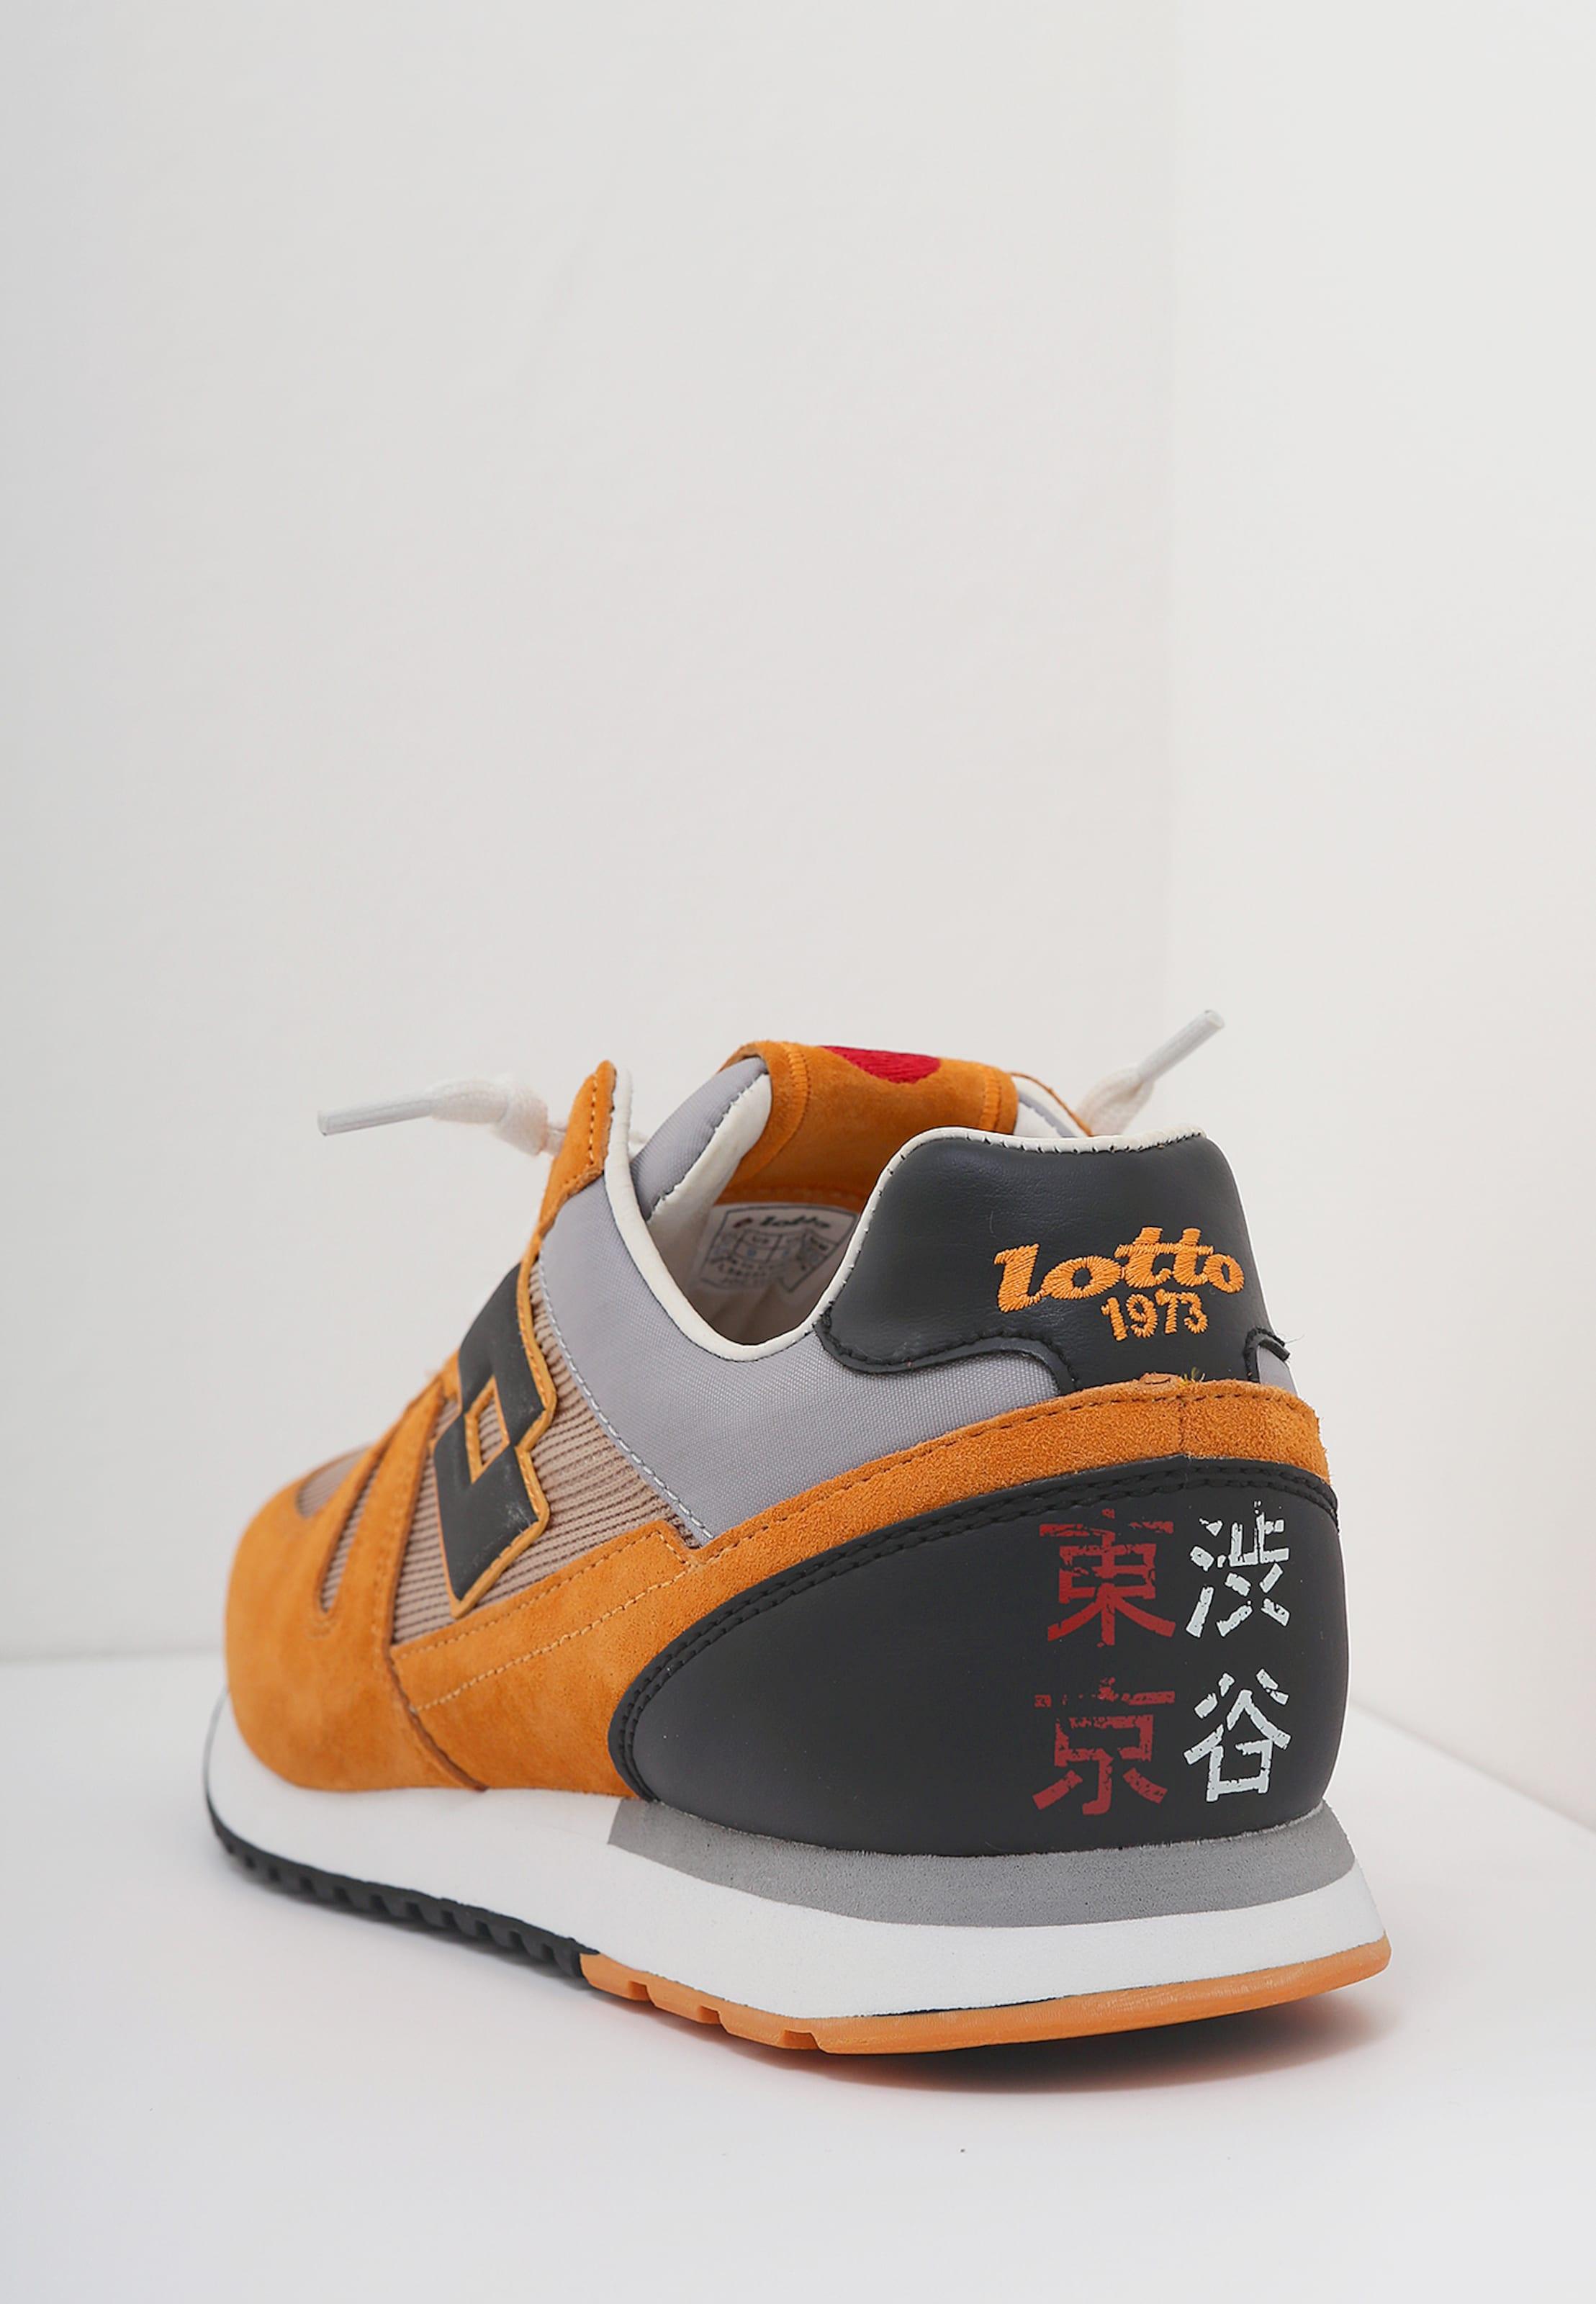 Sneaker Lotto 'tokyo Apricot Shibuya' In Leggenda HellgrauOrange 8n0wkOP